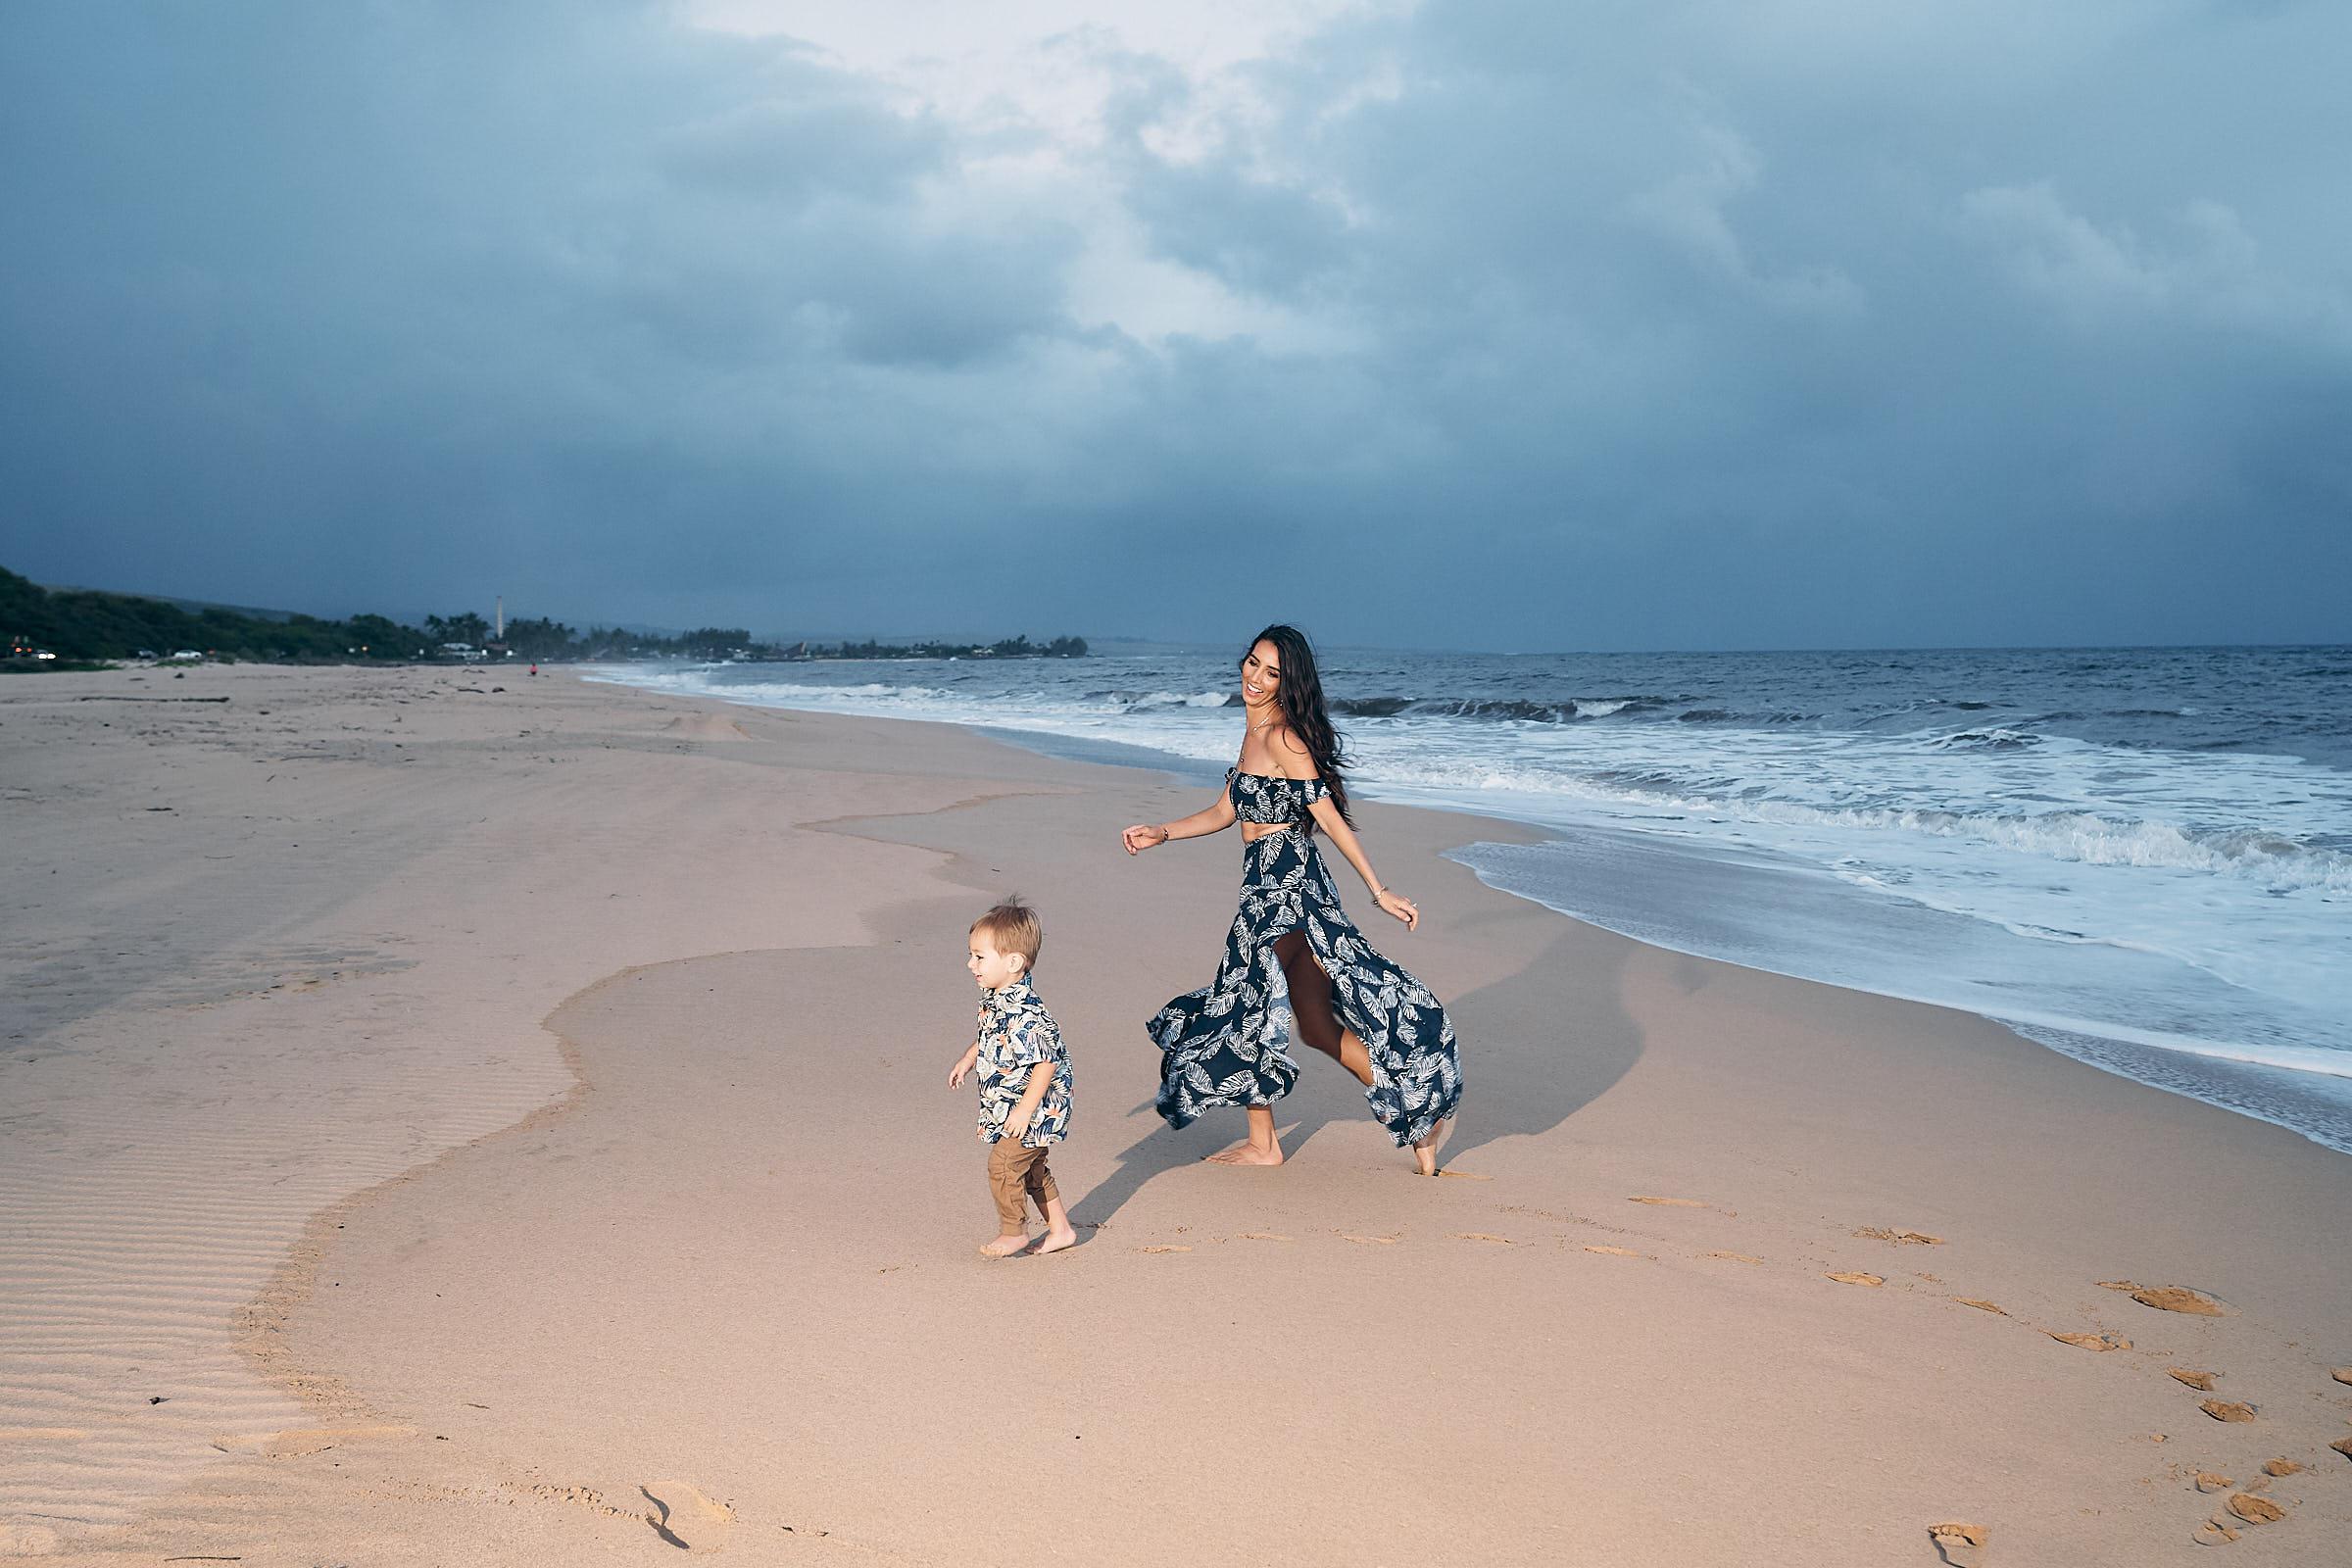 Kauai Beach Family Pictures Mom With Son